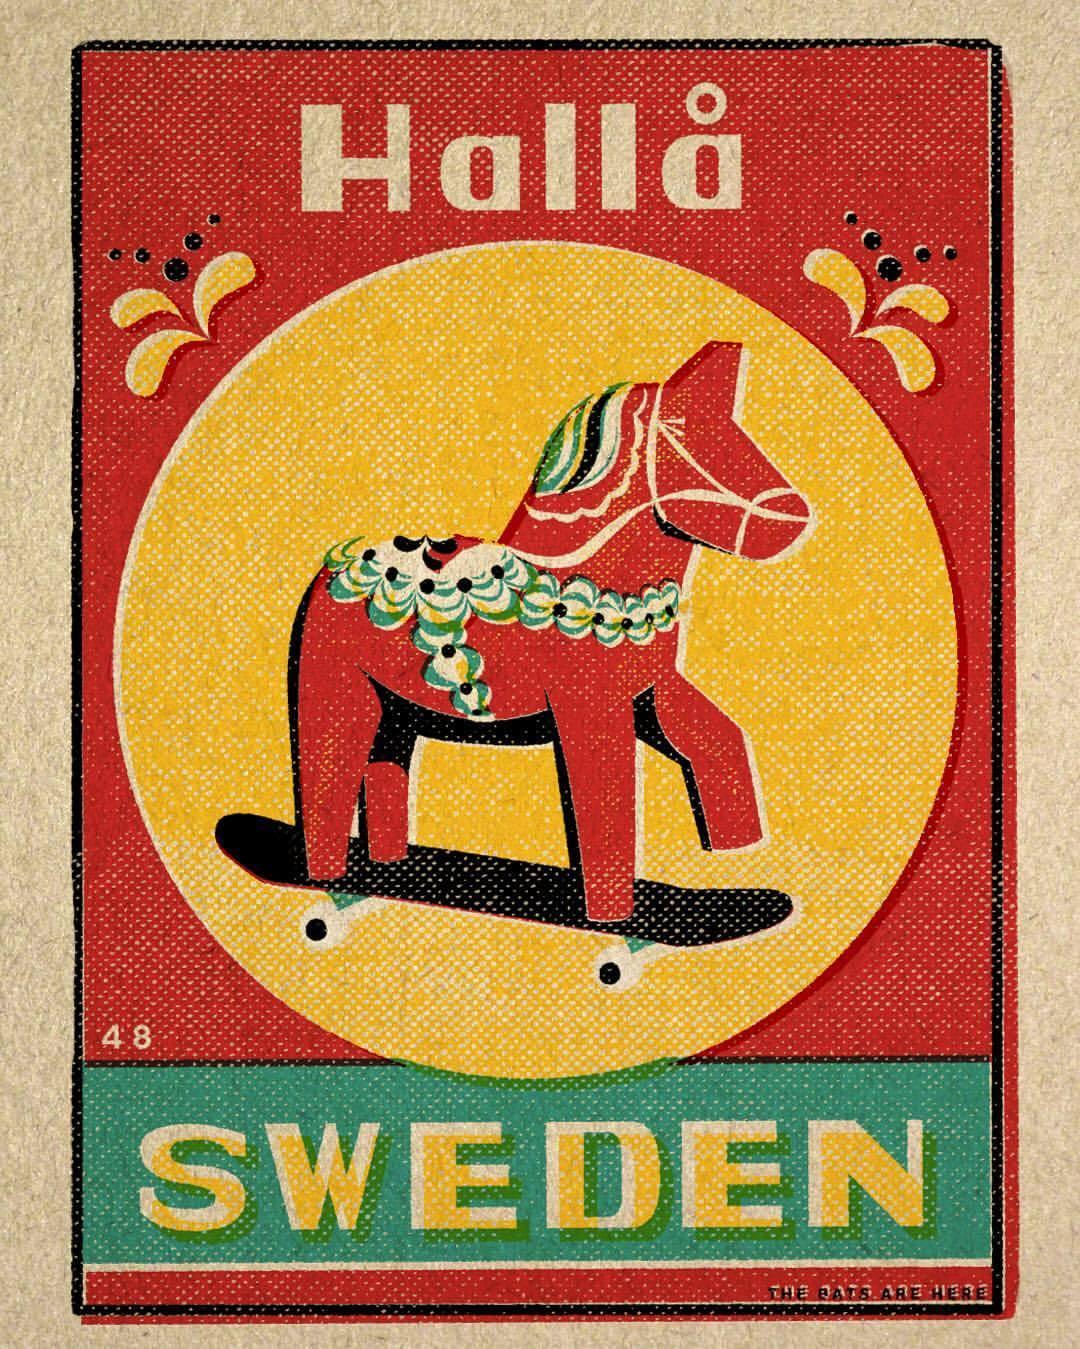 HigherEd-AndyPitts-Place-Sweden.jpg